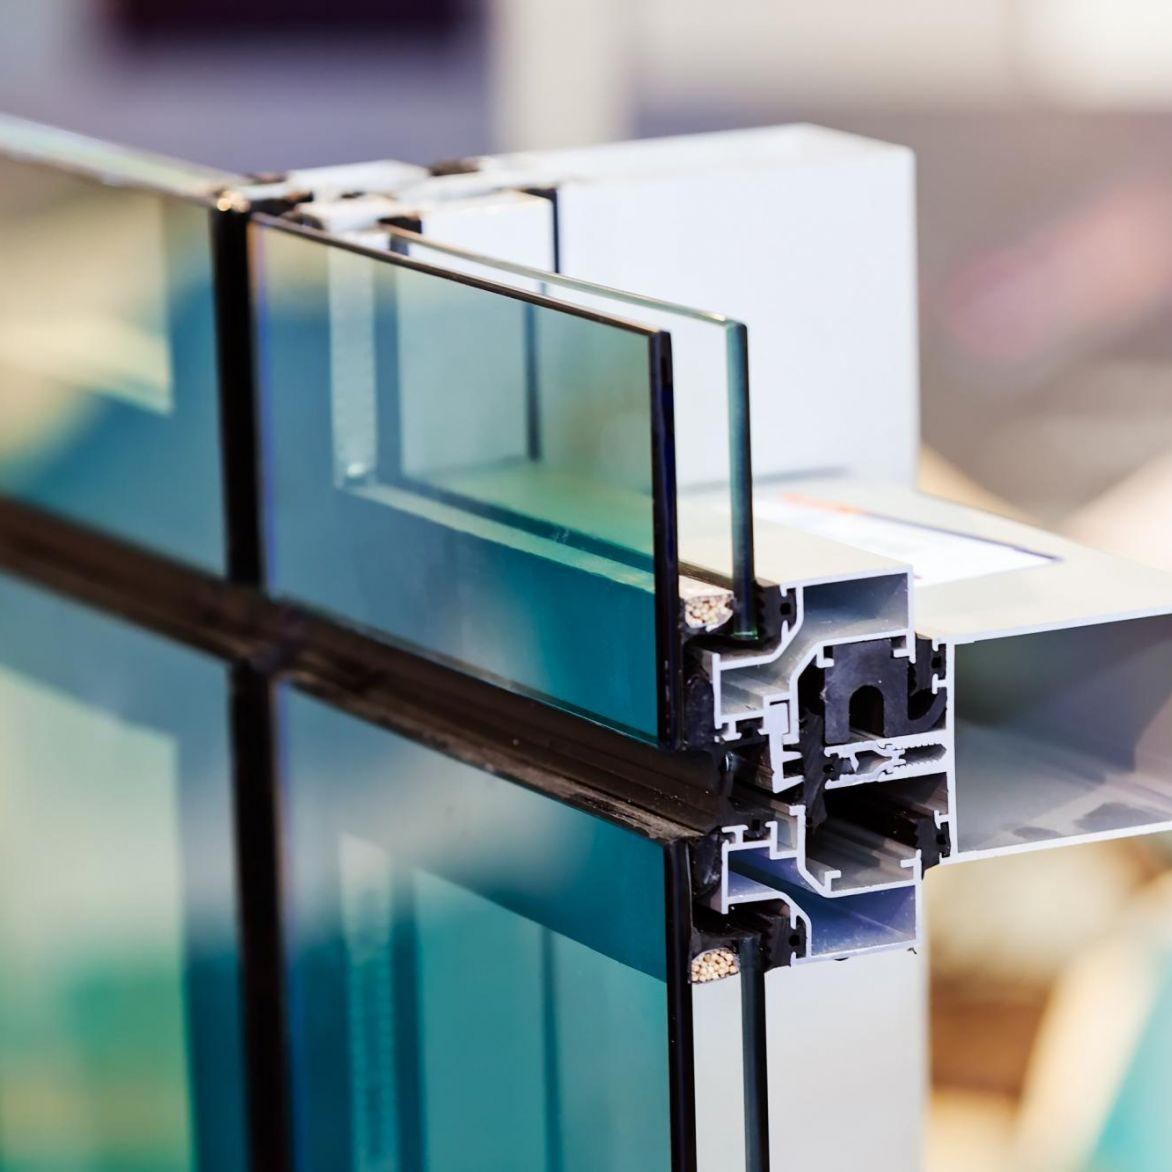 Vidros Insulados: ideais para casas e estabelecimentos